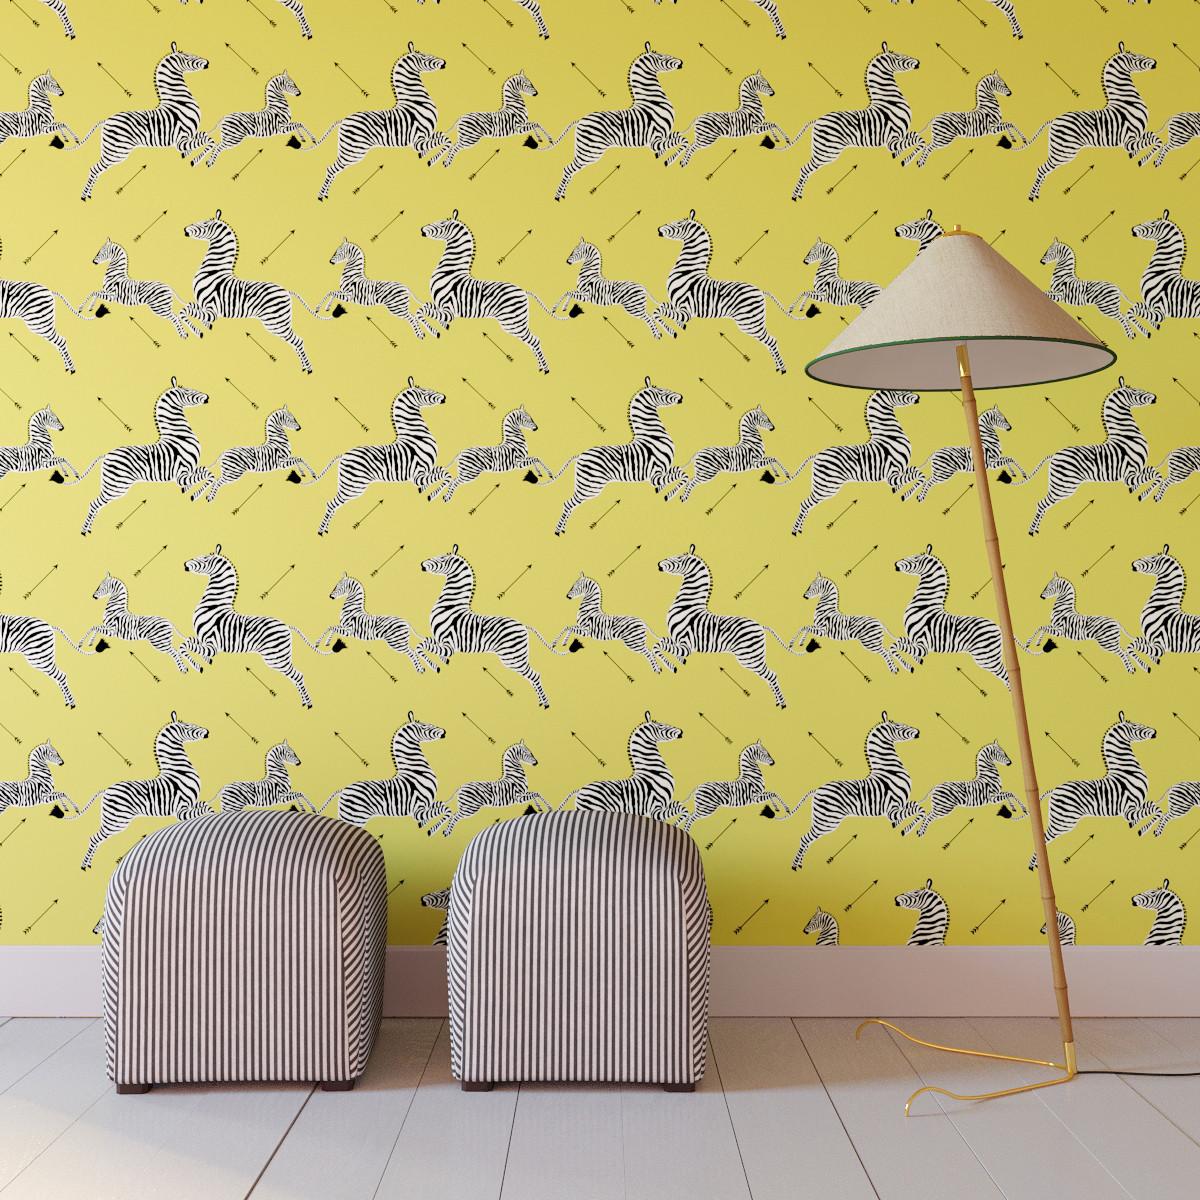 Peel and Stick Wallpaper Roll   Yellow Zebra